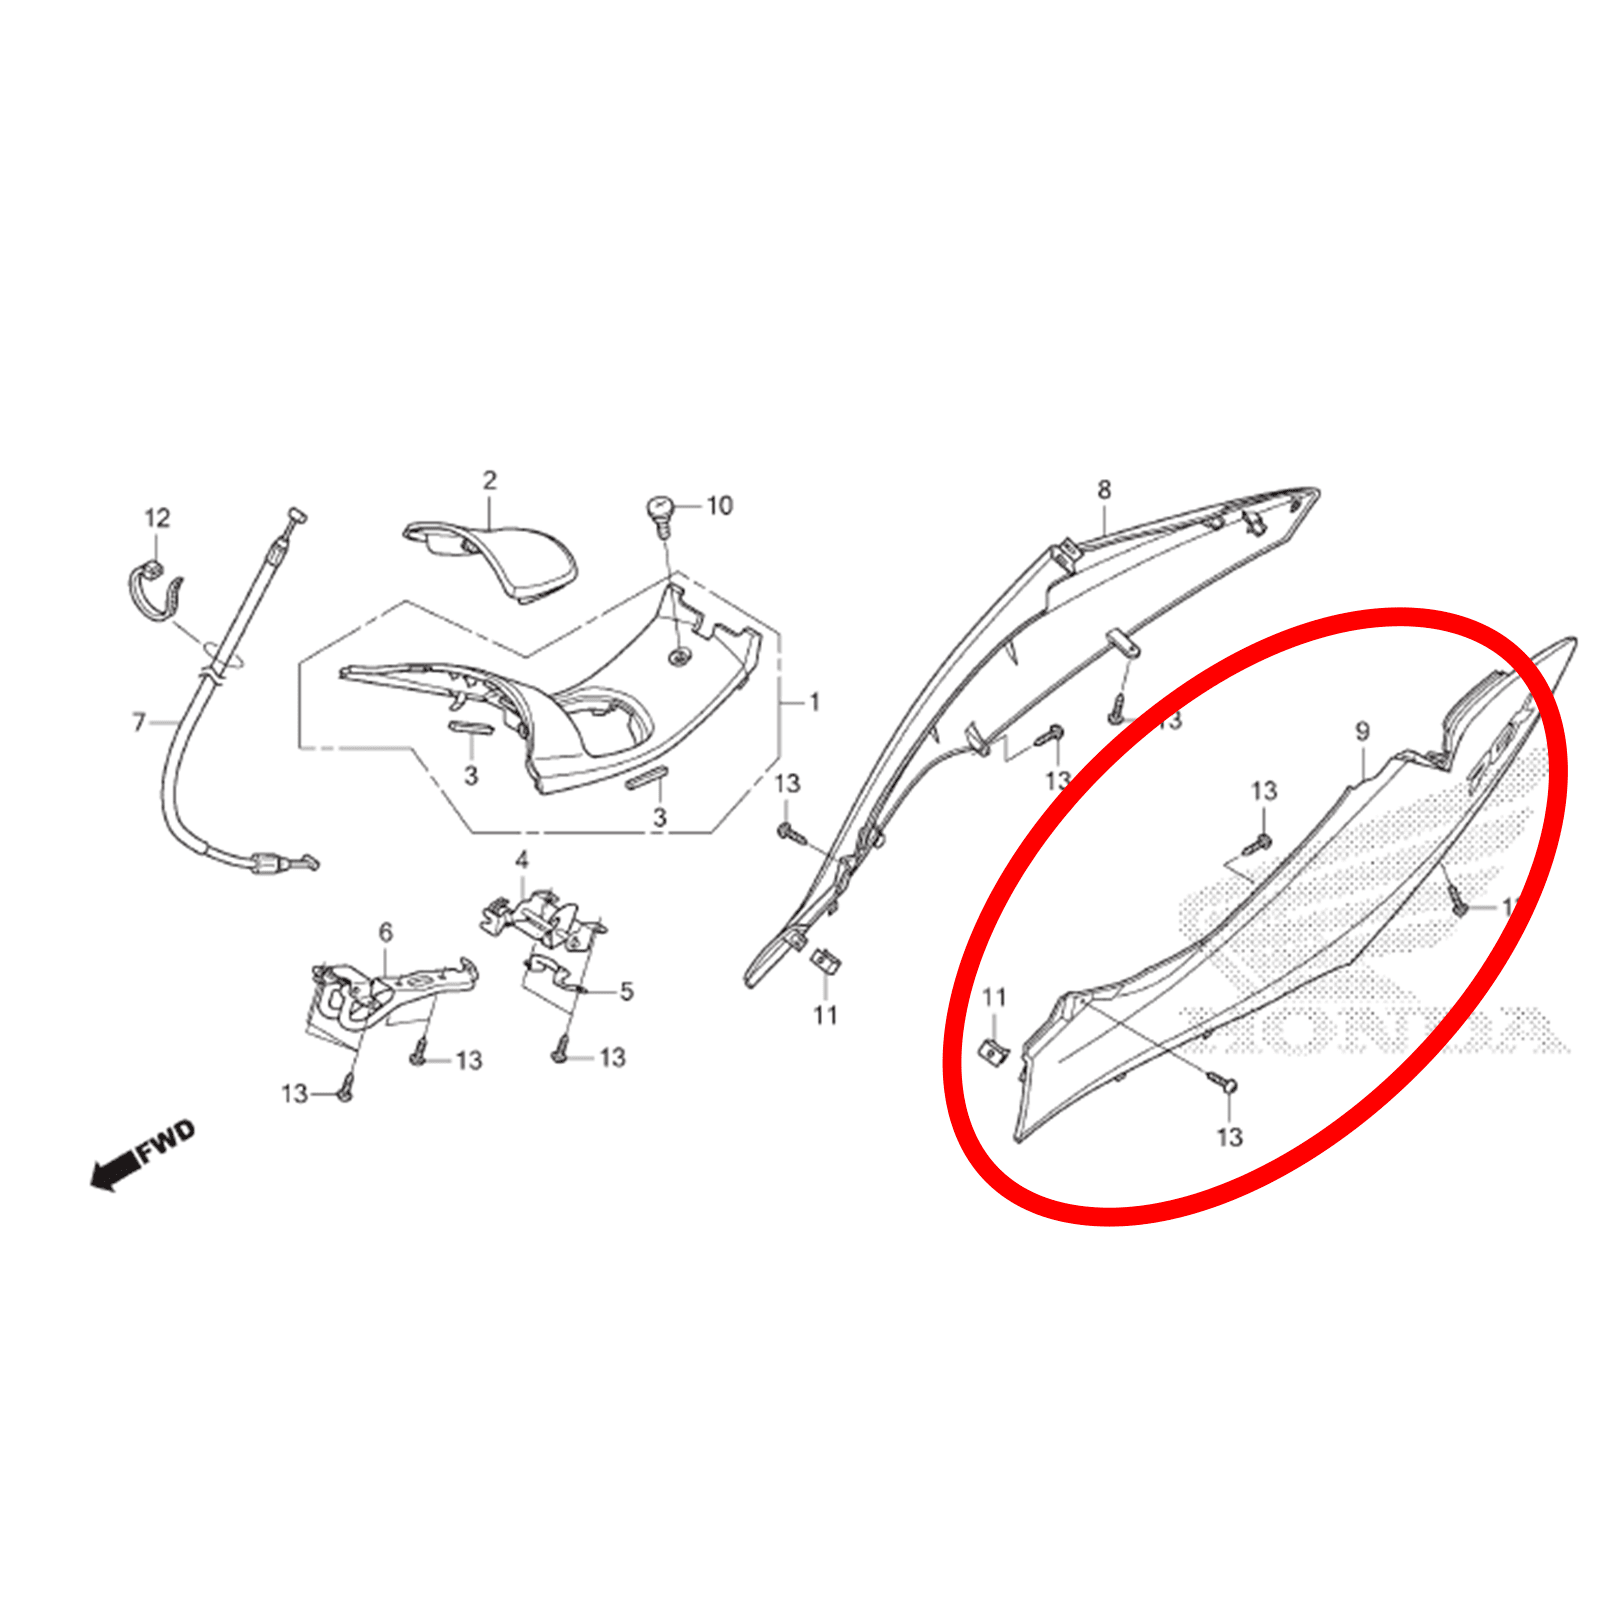 Carenagem Lateral Esquerda Branca Pcx 150 2013 2014 2015 Original Honda 83650KZYB00ZC